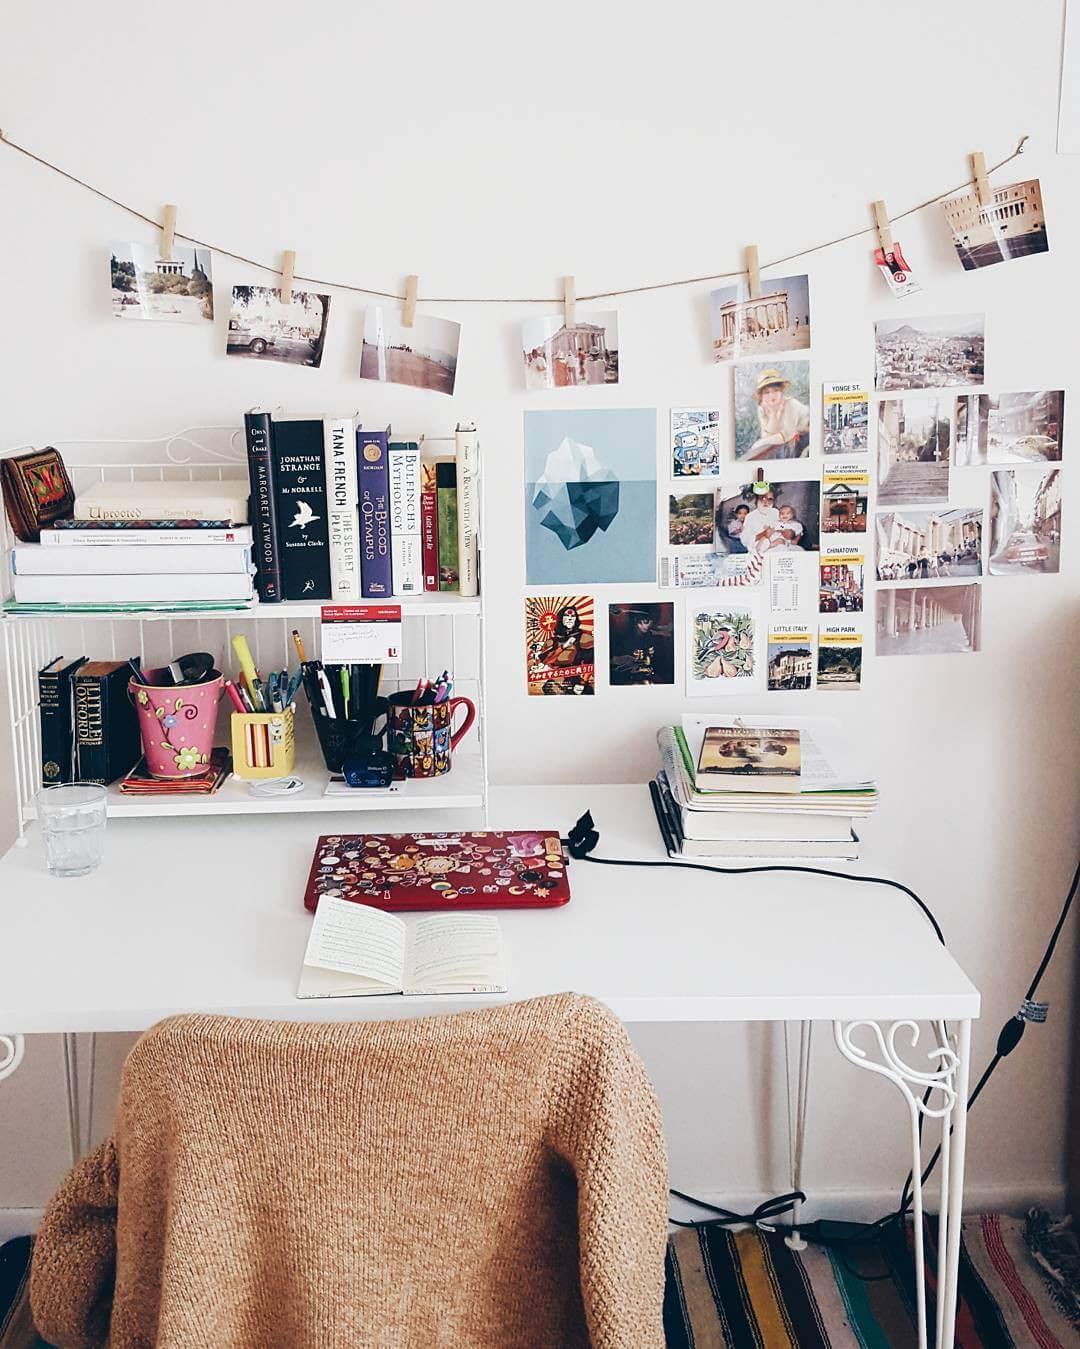 Dorm Room Style: Easy as ABC   LinenMe News on Room Decor Aesthetic id=52106